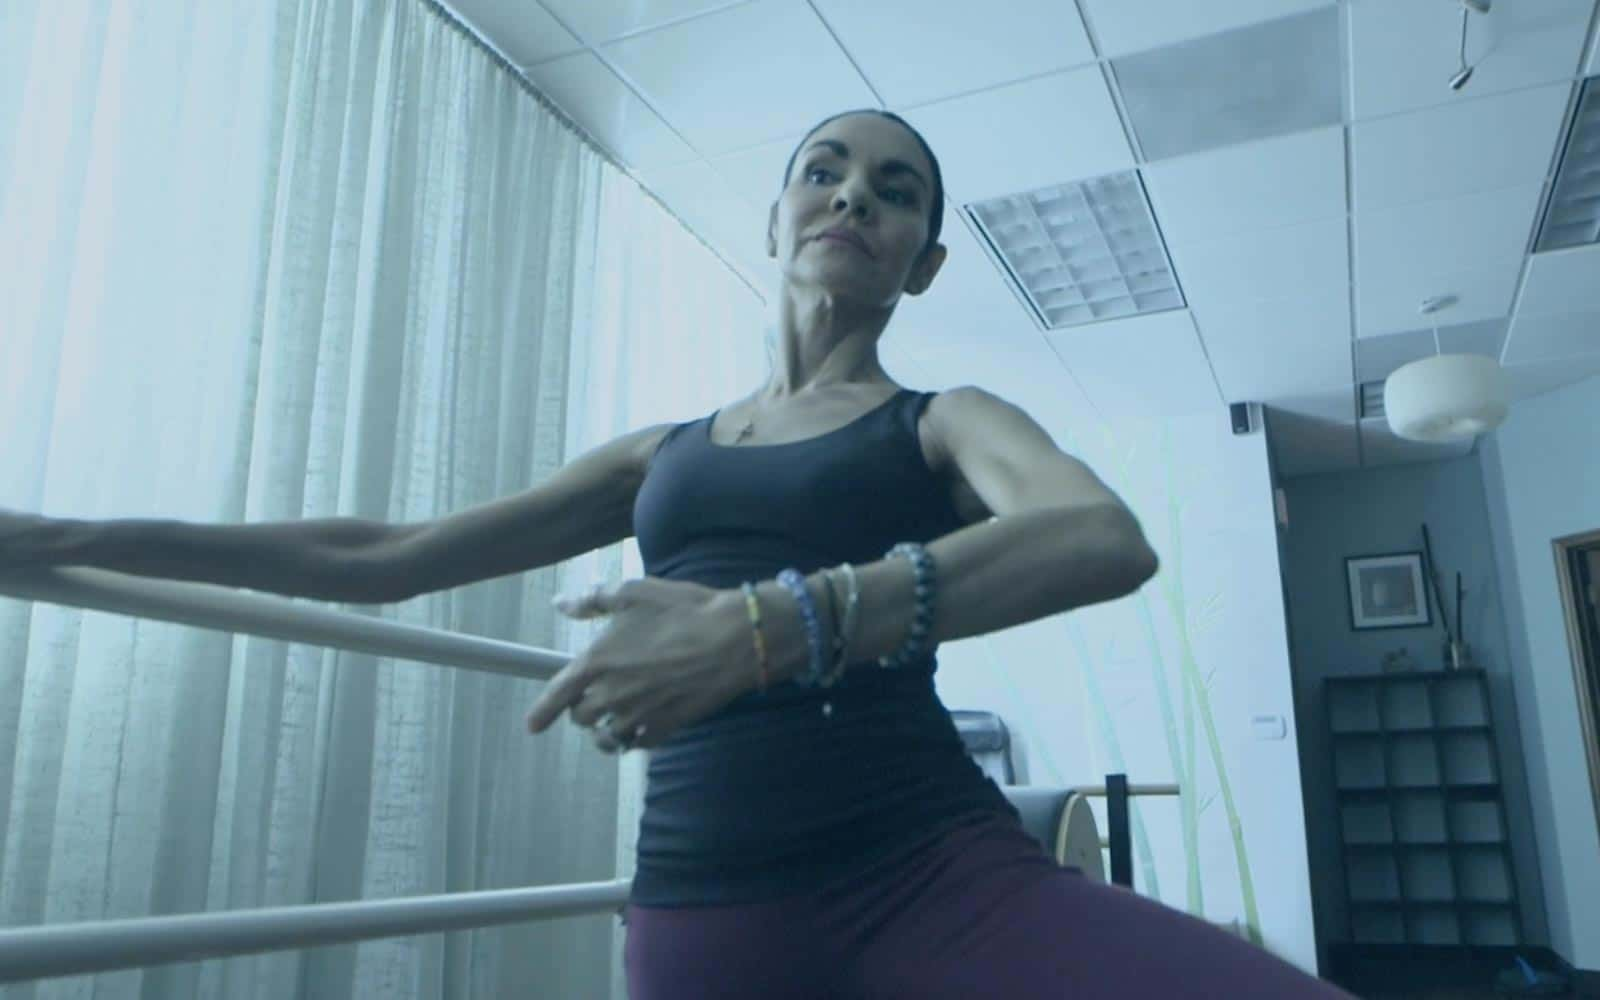 The Beautiful Ballerina